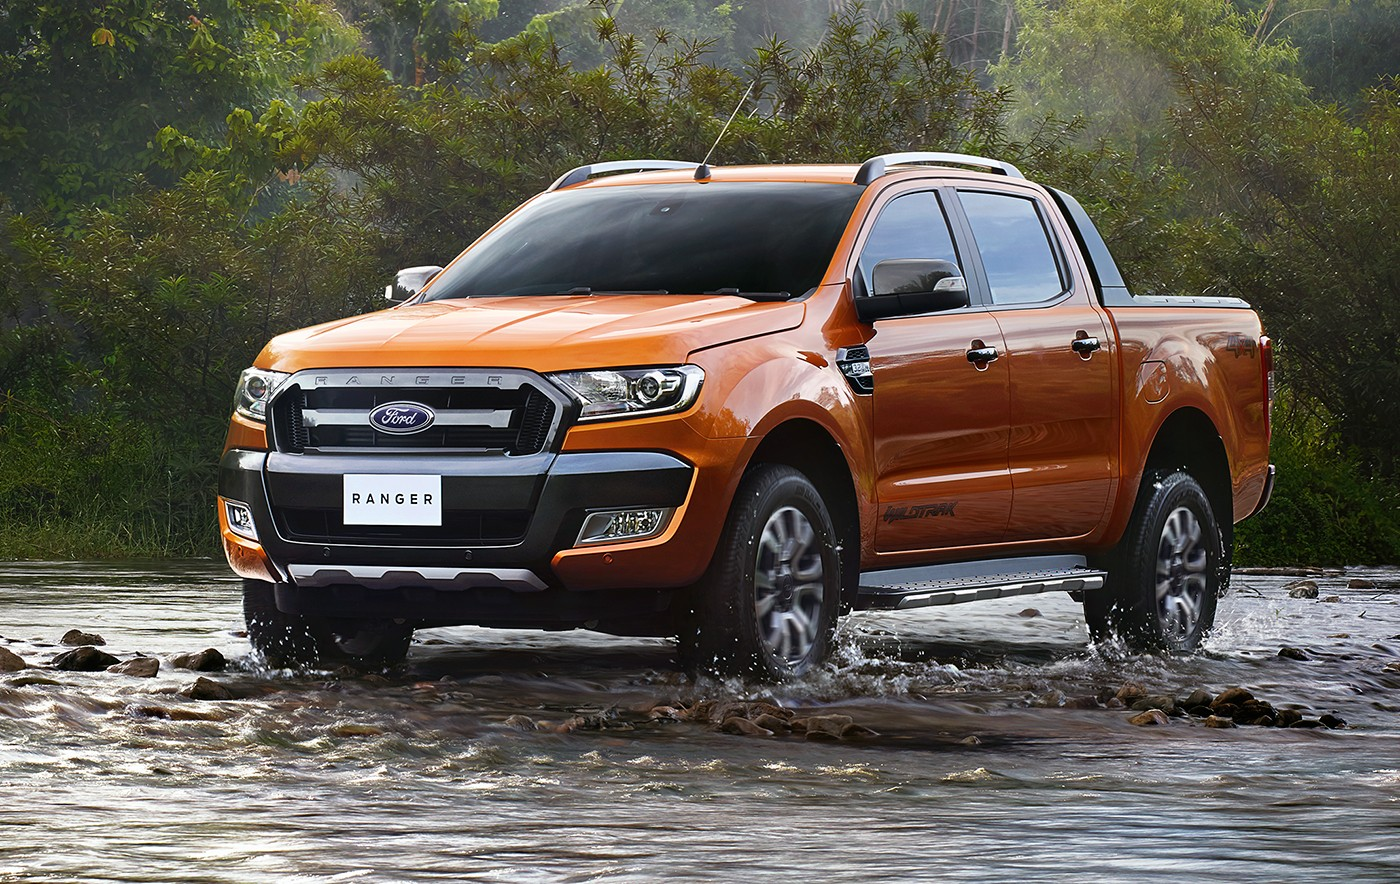 To%2BFord%2BRanger Το αγαπημένο pickup της Ευρώπης, τo Ford Ranger, είναι και το ασφαλέστερο Euro NCAP, Ford, Ford Ranger, Pick-up